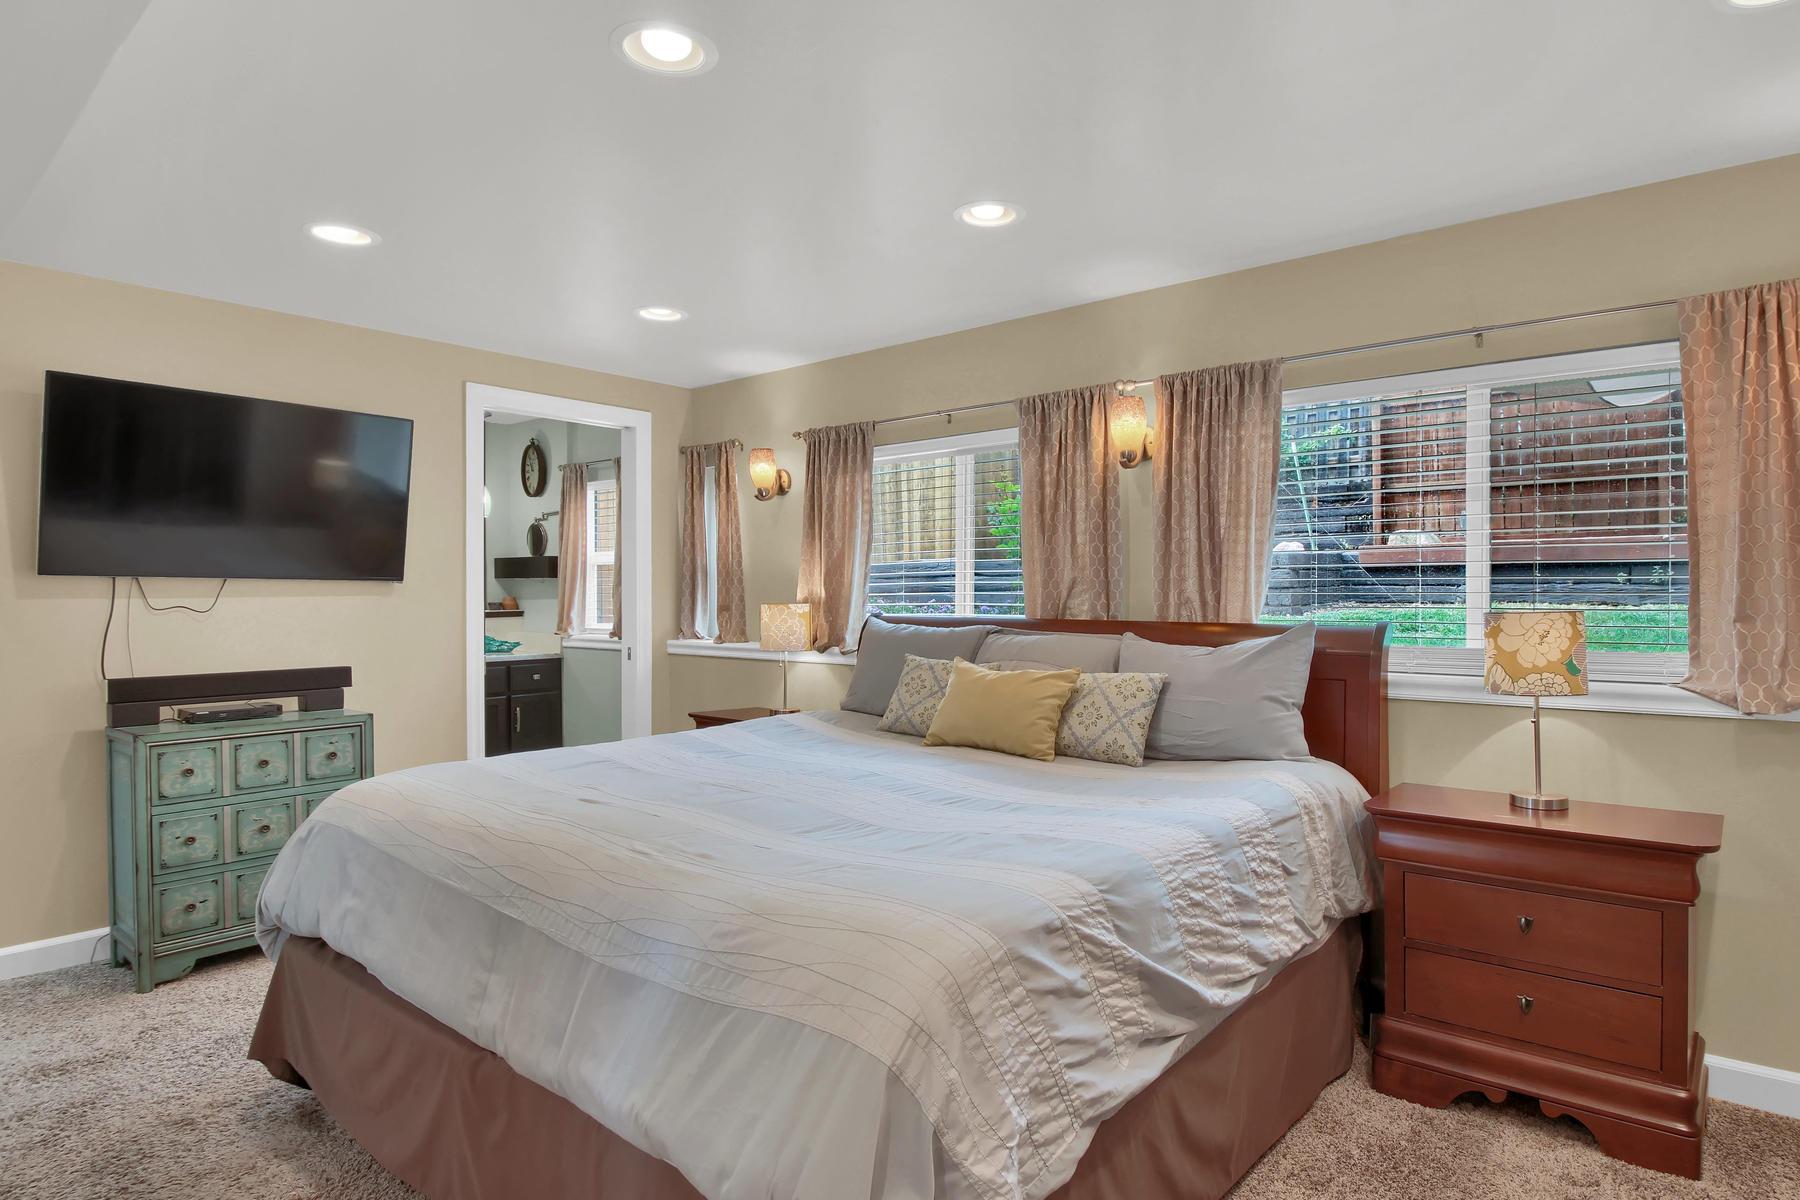 10283 Robb St Westminster CO-011-12-Bedroom-MLS_Size.jpg